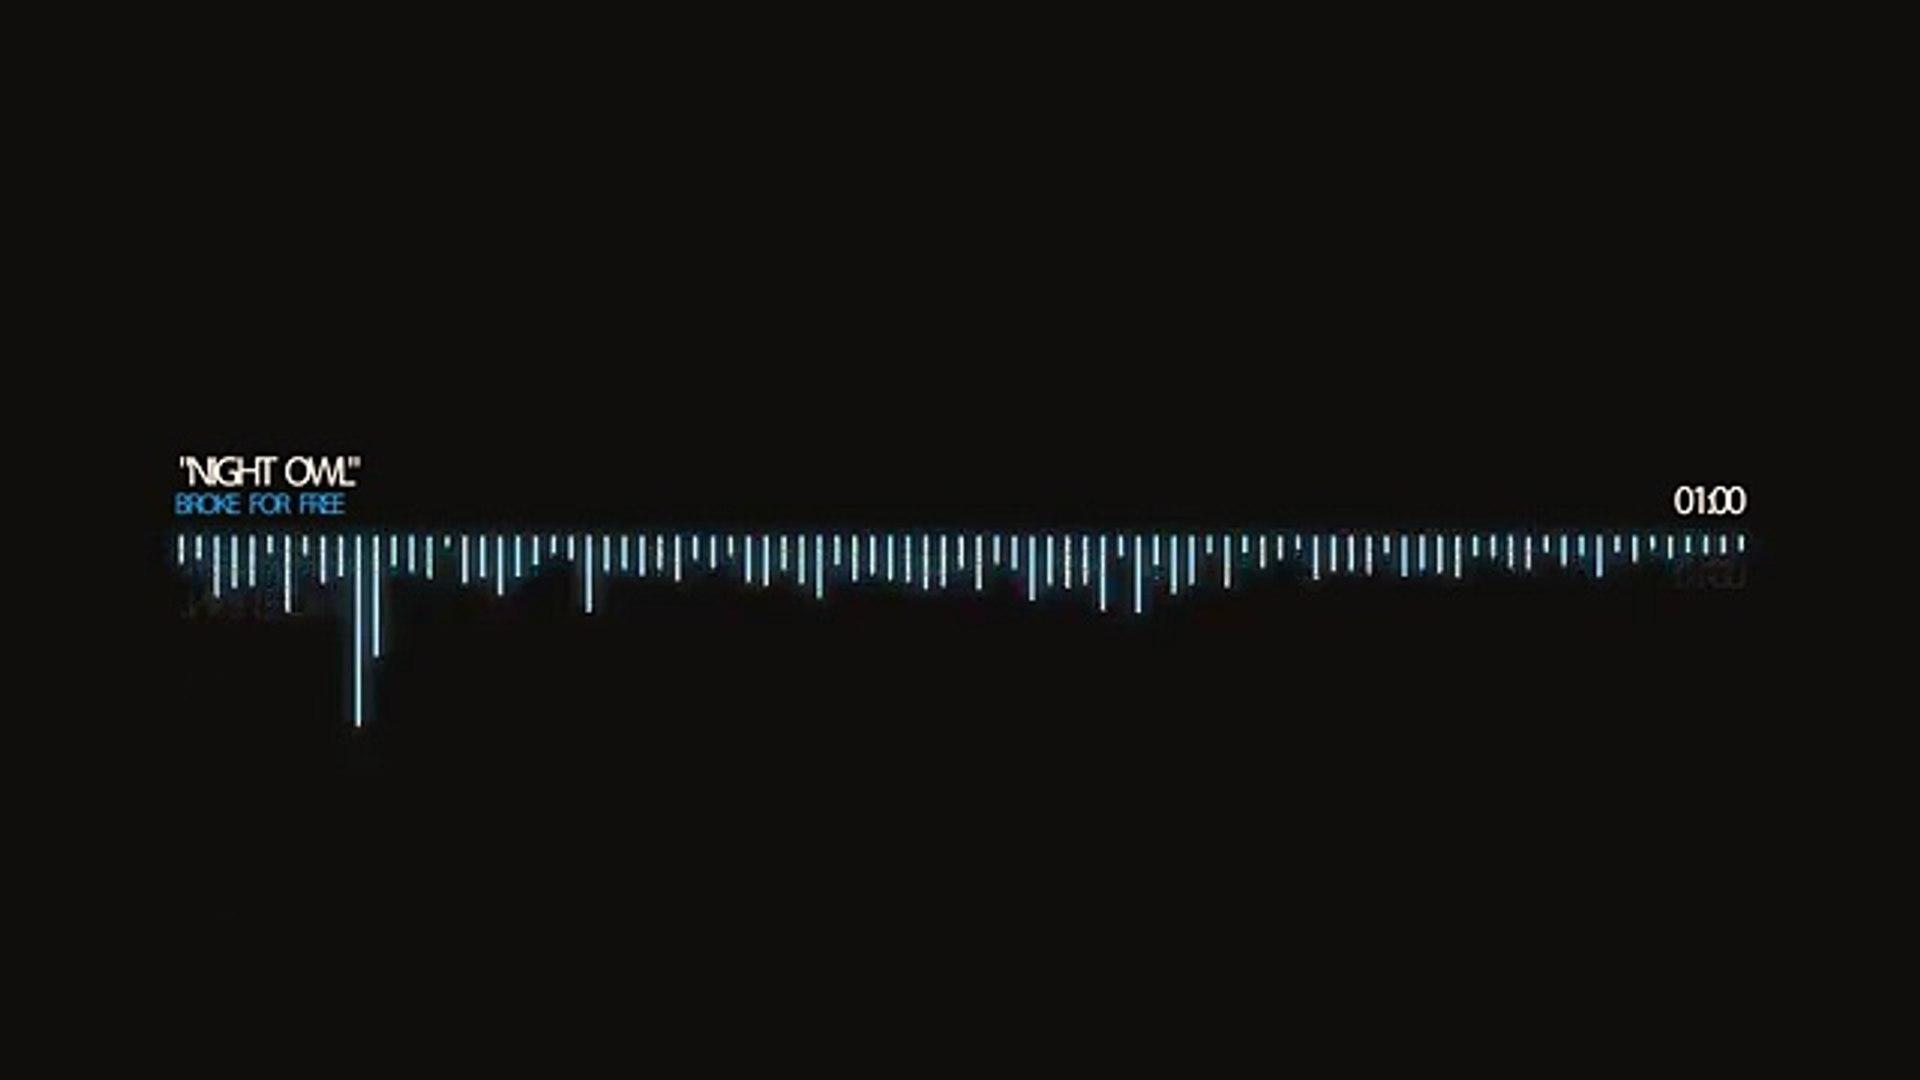 Broke For Free   Night Owl Free Music Download Creative commons Music (World Music 720p)